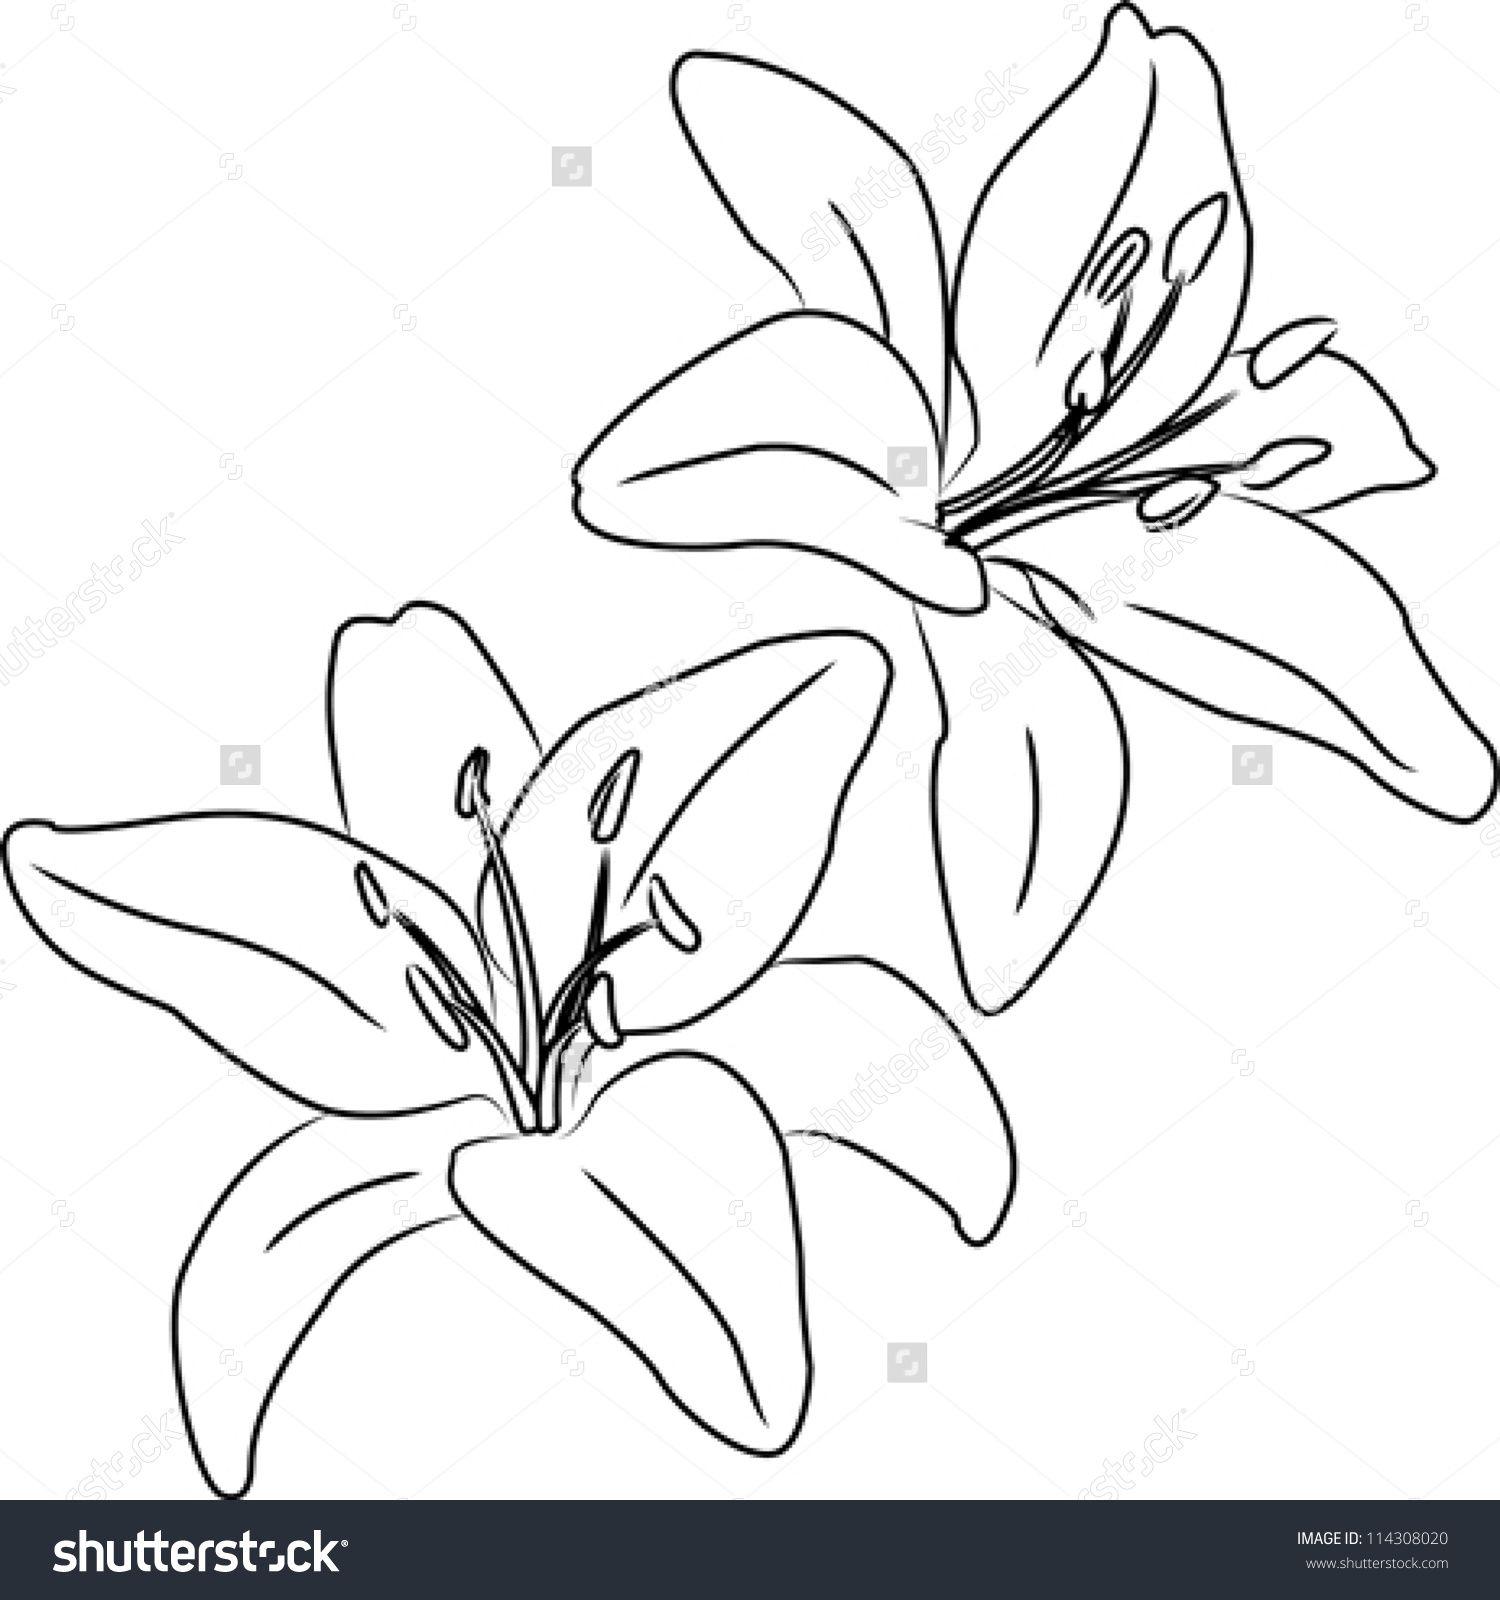 Pin By Vivian Draper On To Do List Pinterest Drawings Flowers